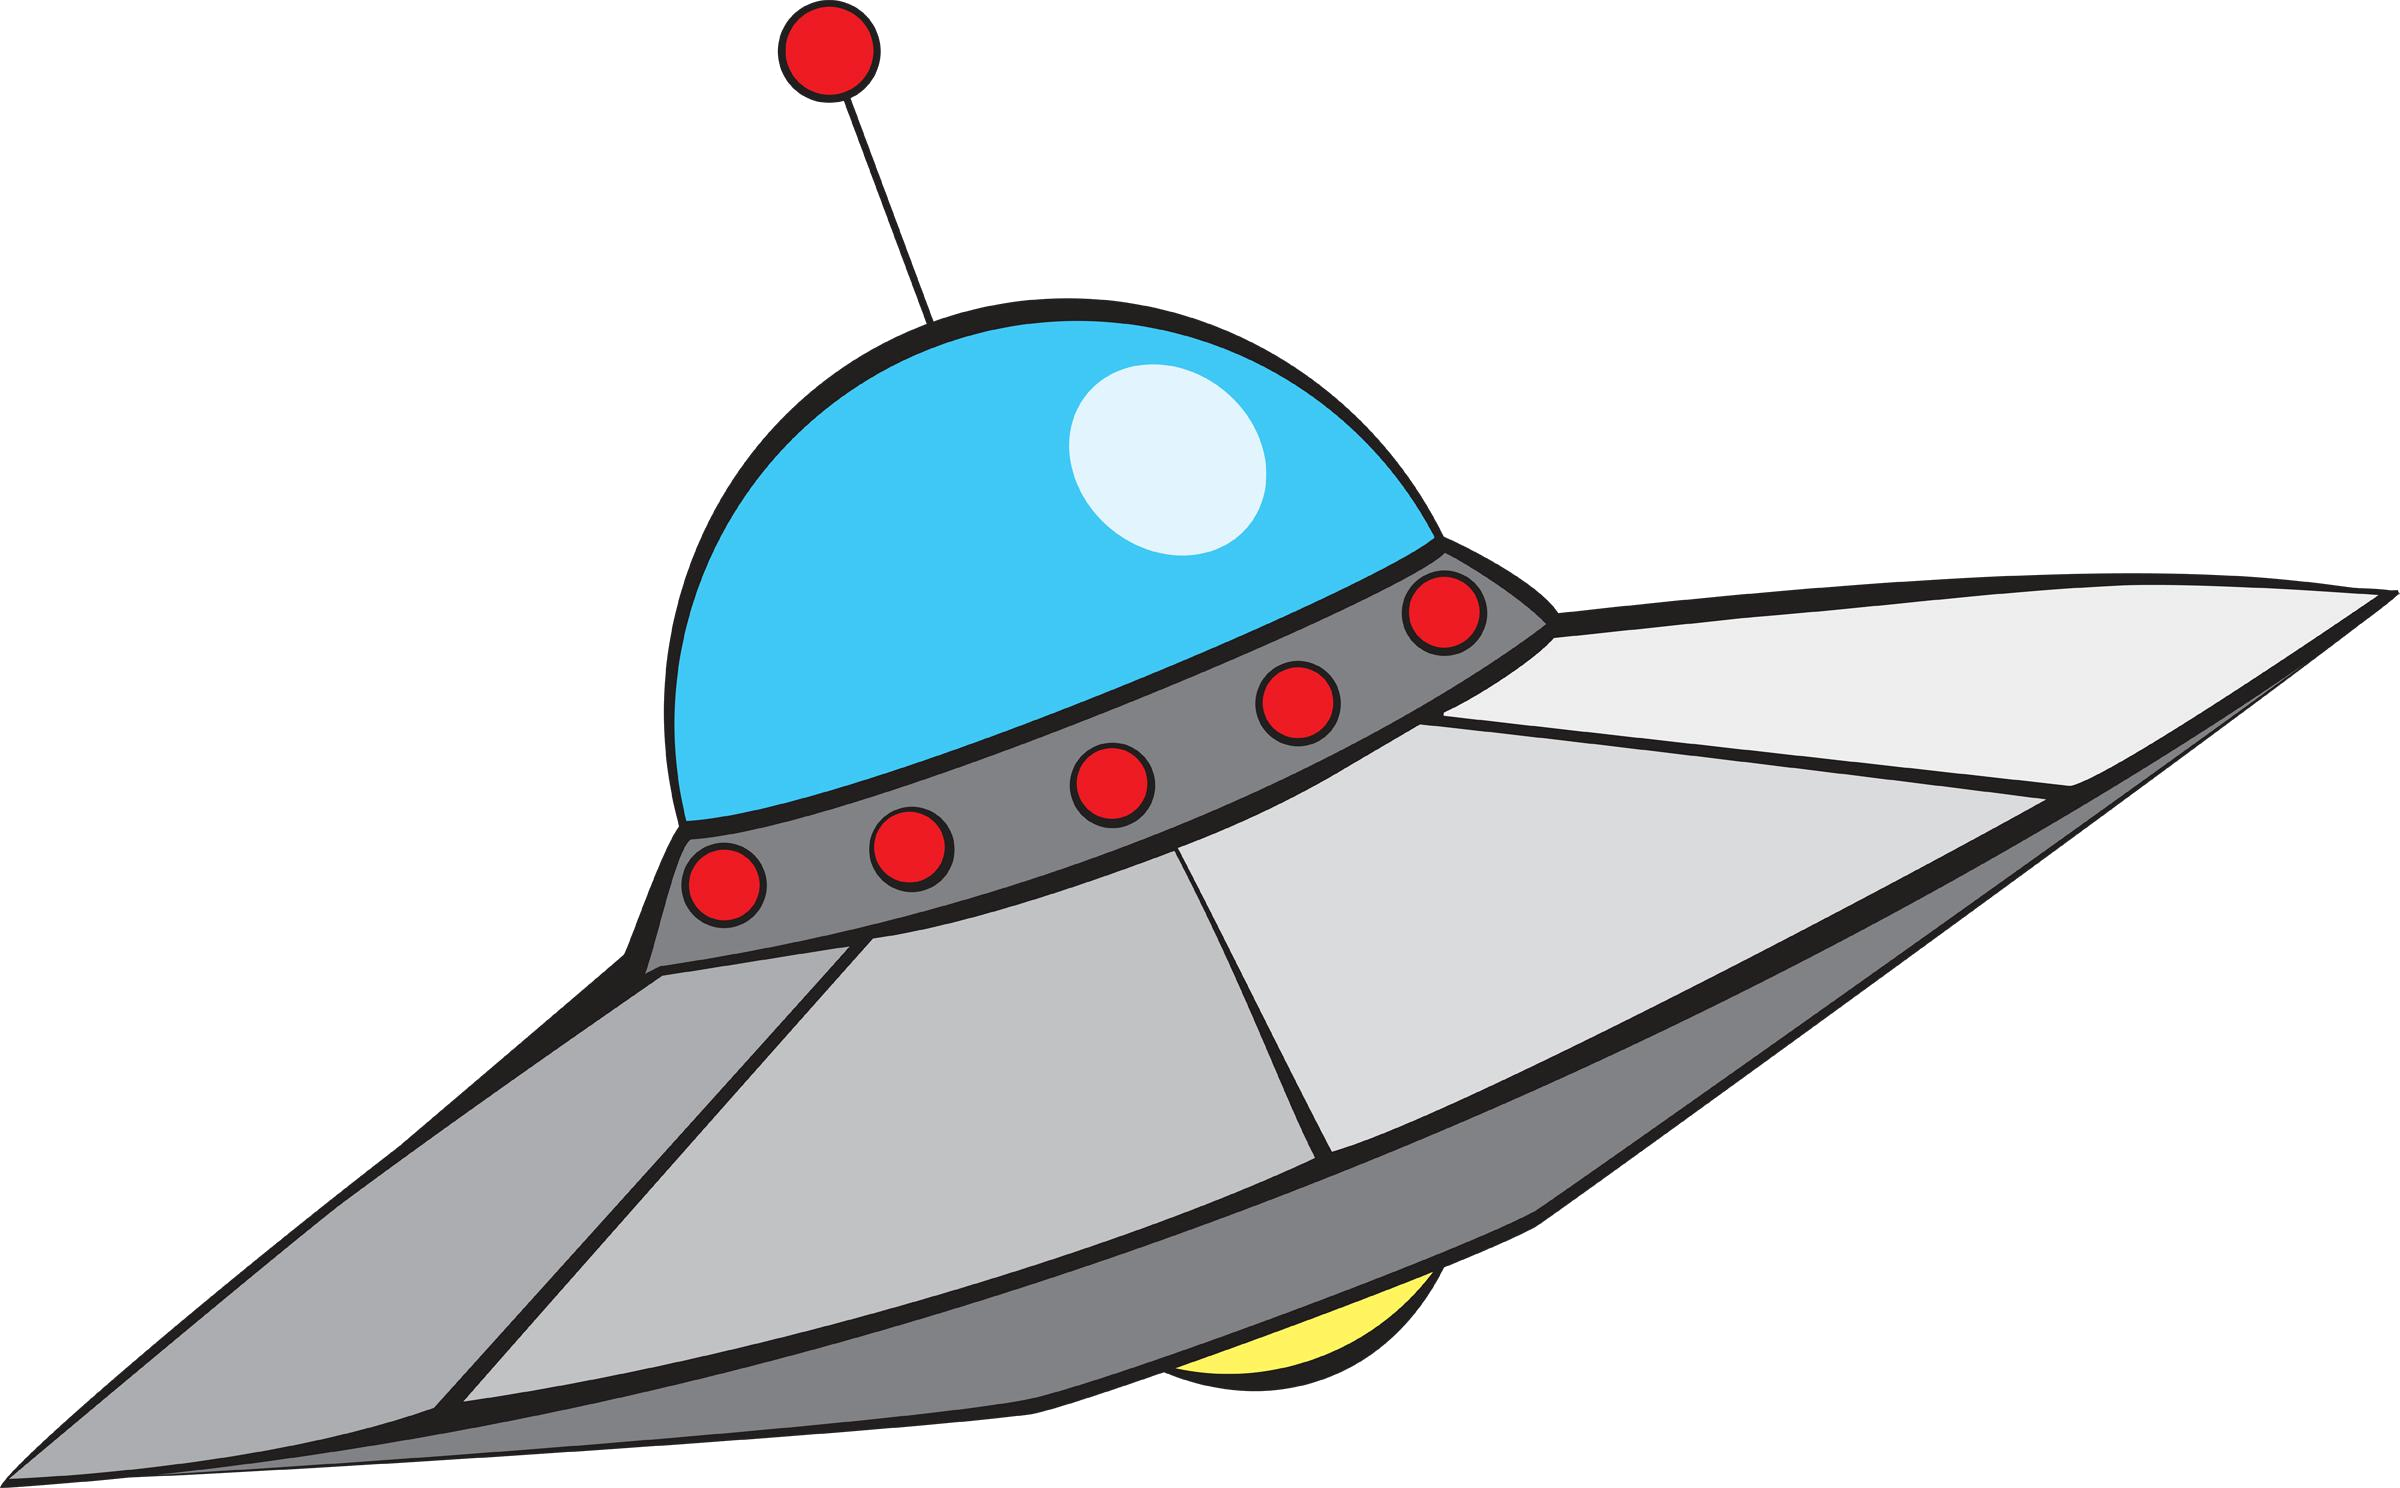 Rocket ship transparent png. Rocketship clipart space craft